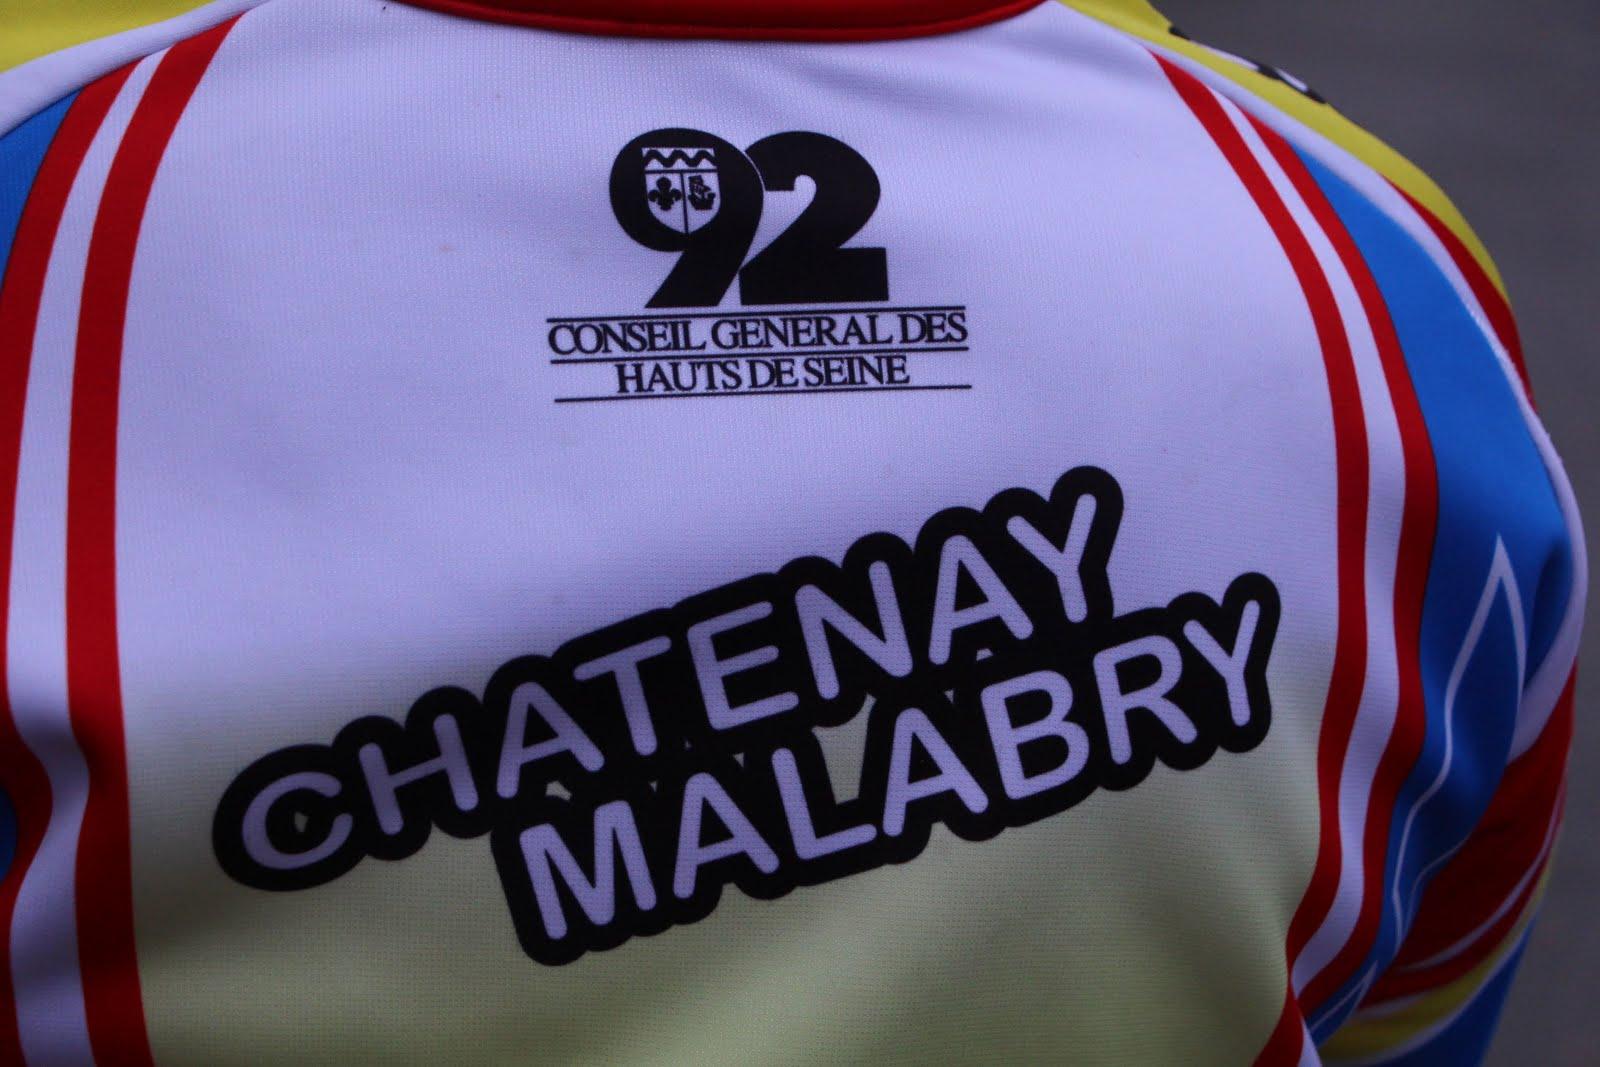 ASVCM CYCLO - CHATENAY MALABRY  - 92290